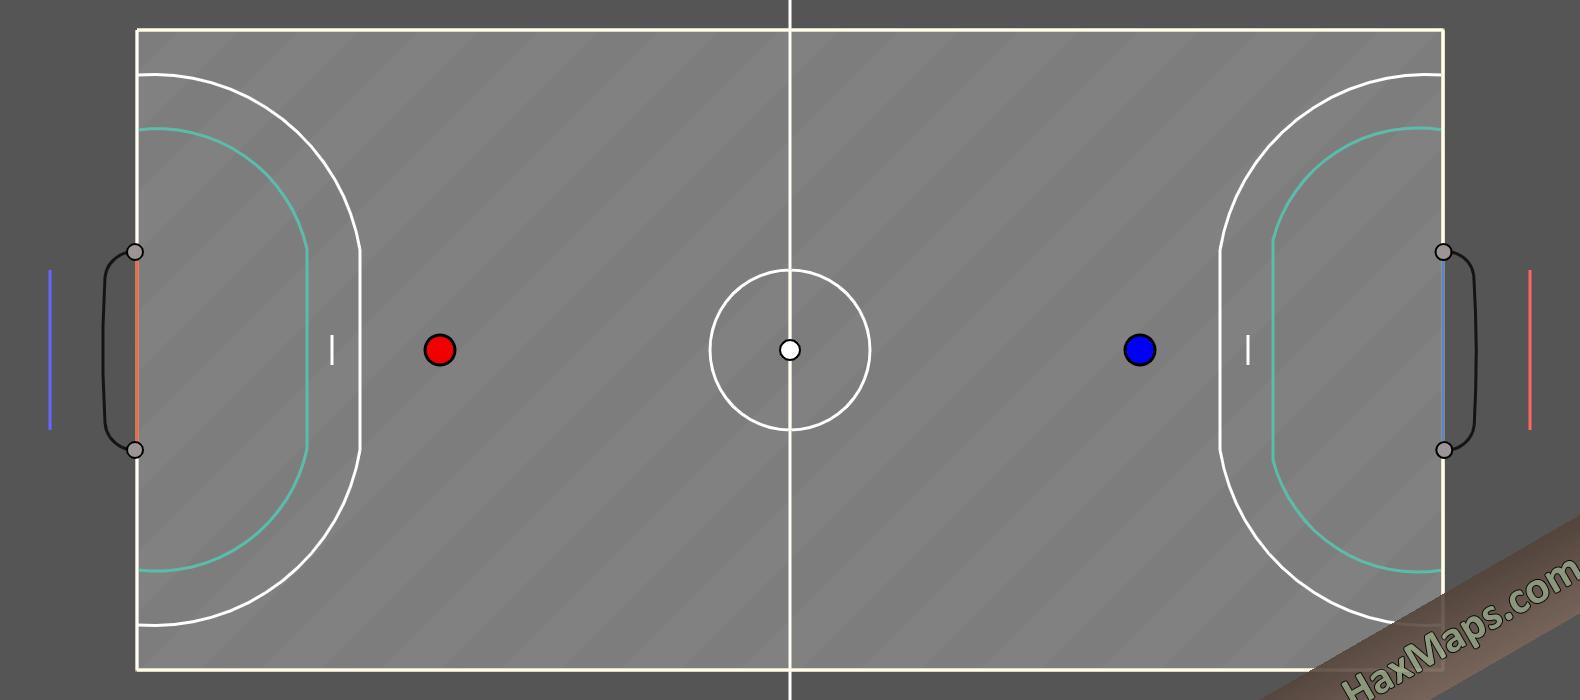 hax ball maps | Handball v2.0.1 Chupar & GLH